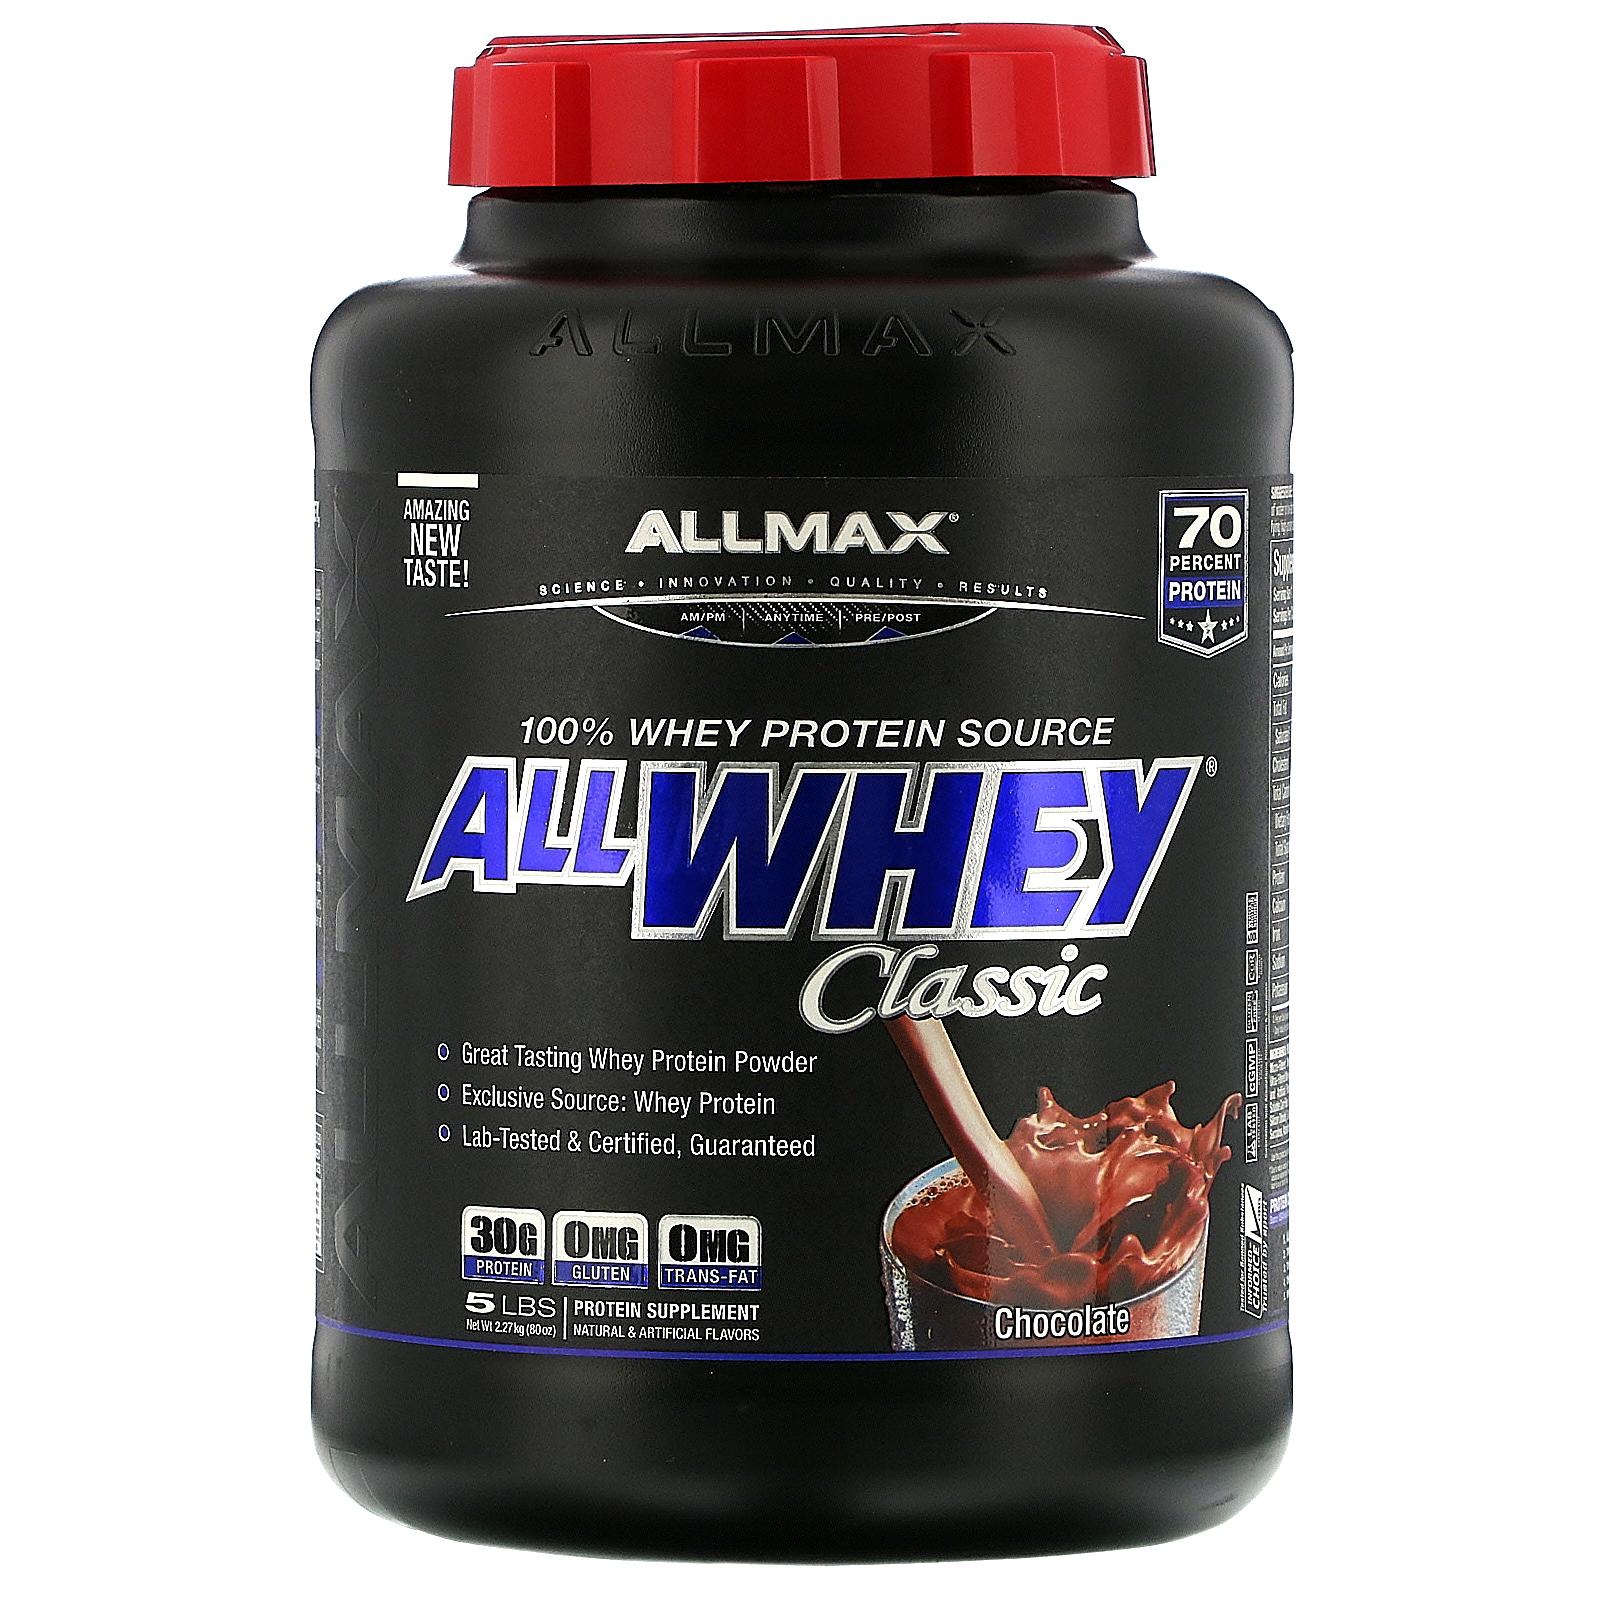 AllWhey classic اسعار الواي بروتين أنواع الواي بروتين استخدام الواي بروتين للمبتدئين واي بروتين ايزوليت تجربتي مع الواي بروتين واي بروتين للبنات واي بروتين جولد ستاندرد كم سكوب واي بروتين بعد التمرين